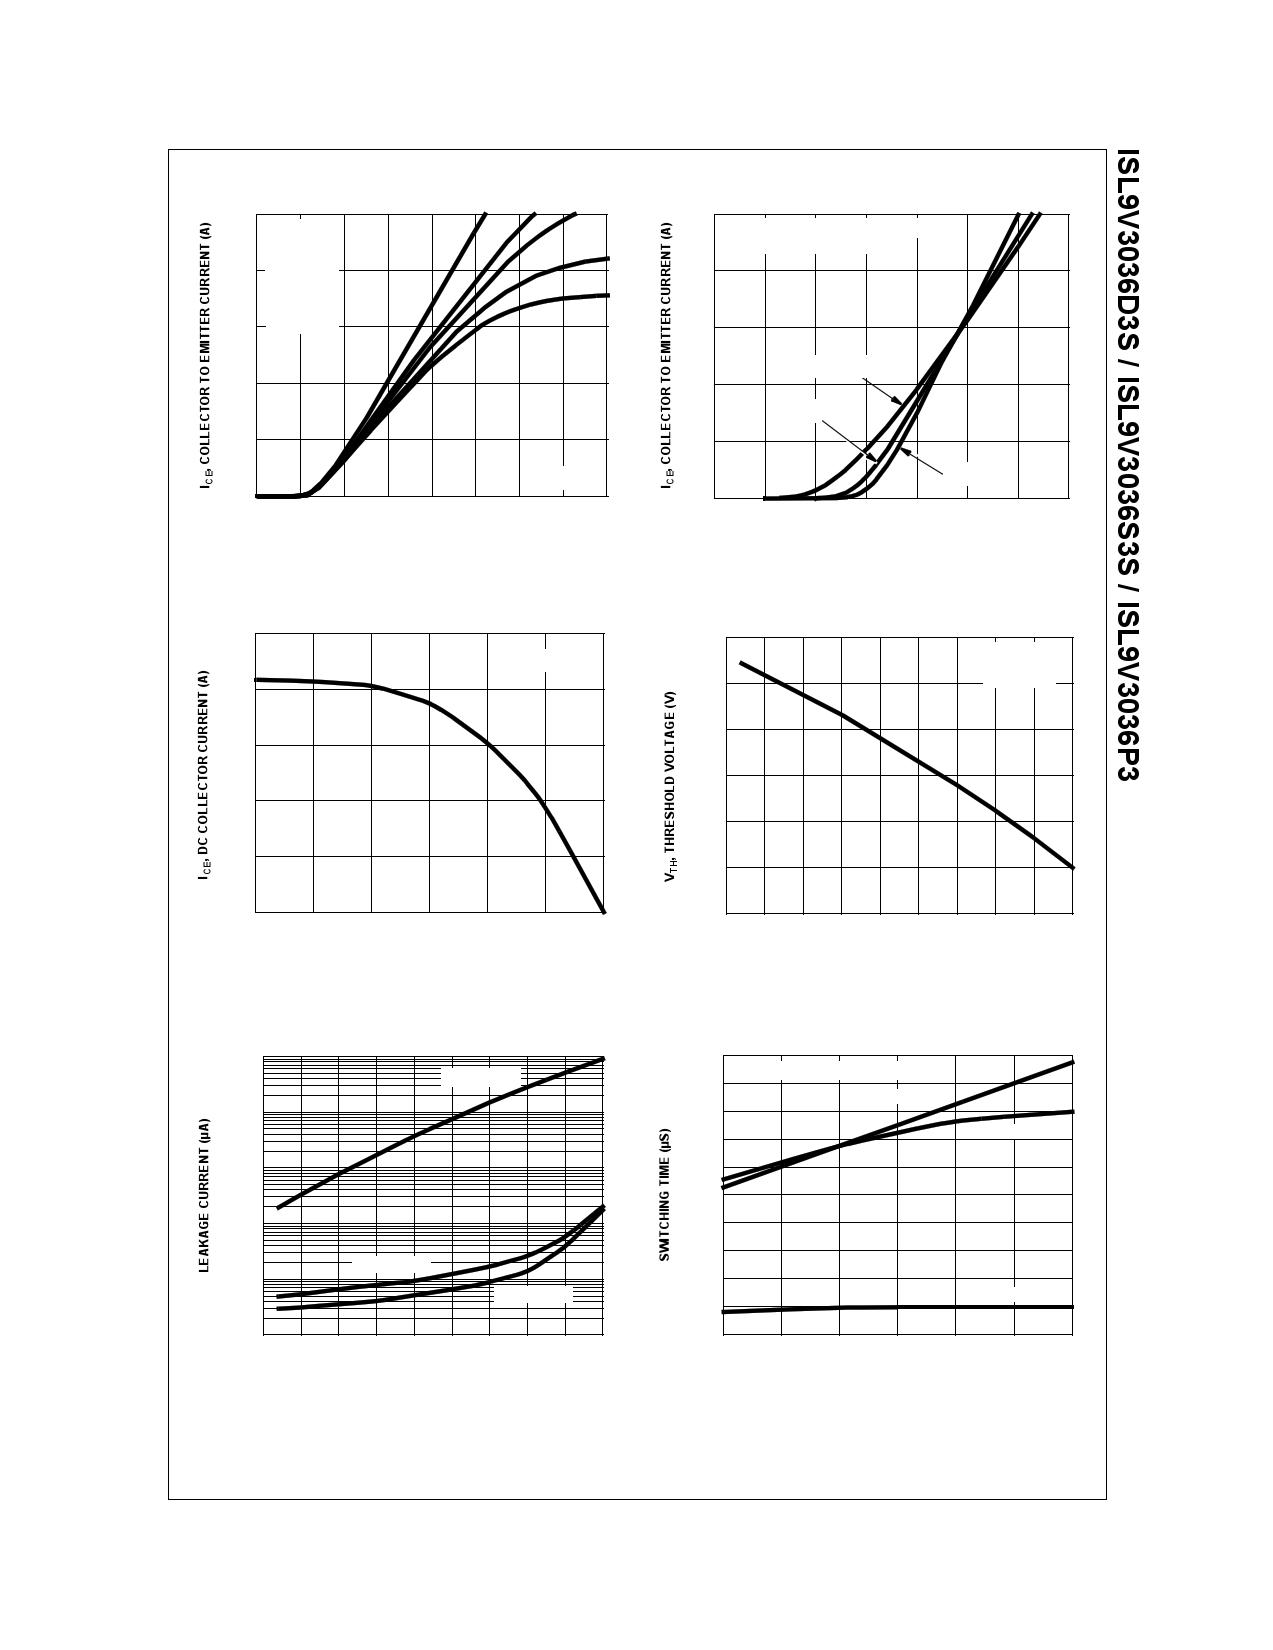 ISL9V3036D3S pdf, 반도체, 판매, 대치품